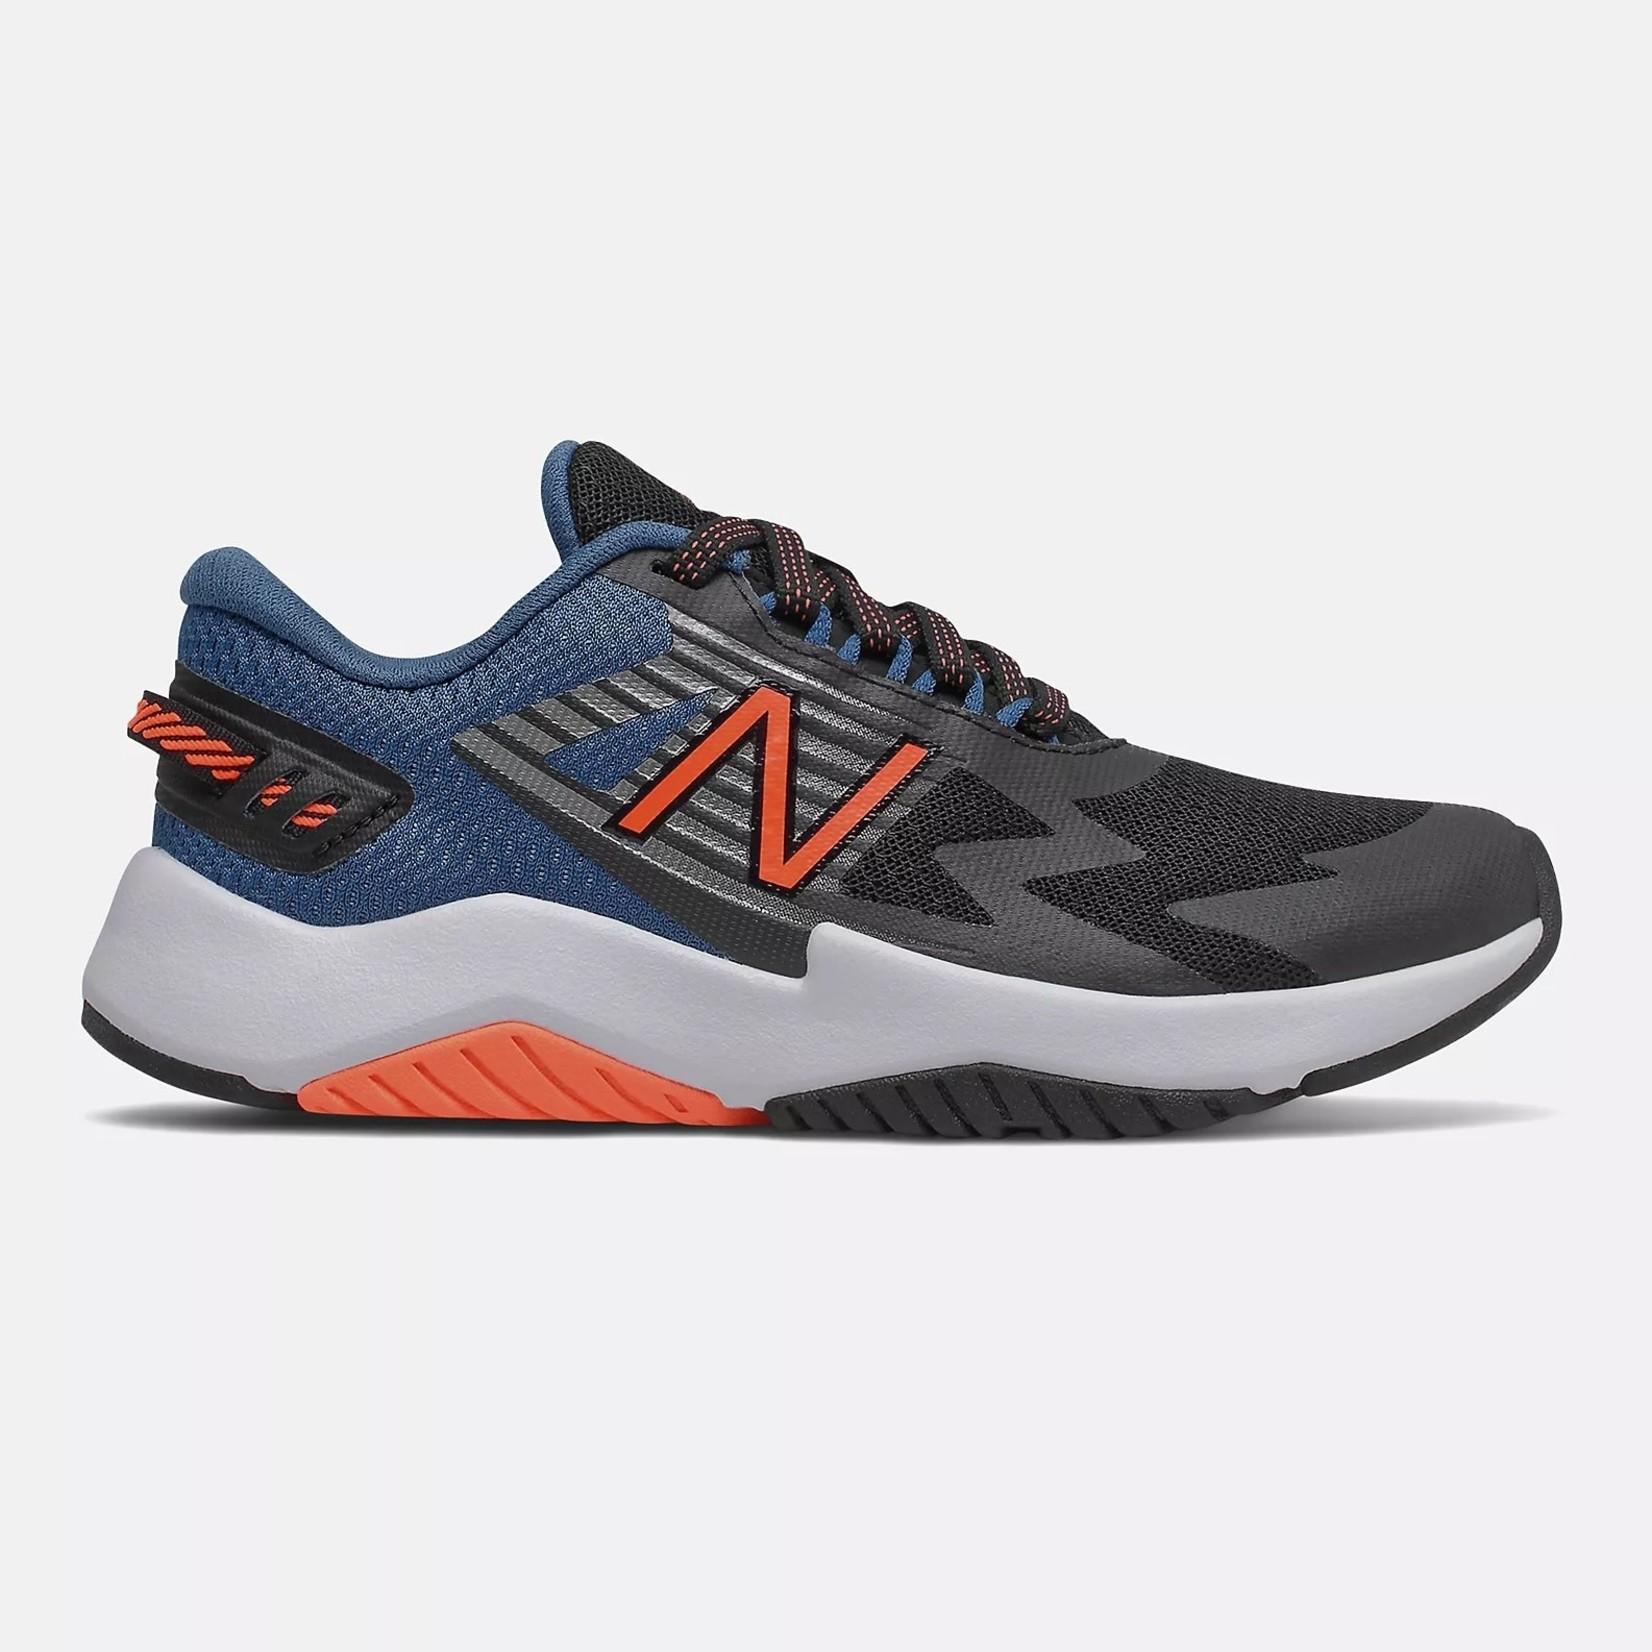 New Balance New Balance Running Shoes, Rave Run, BGS, Boys